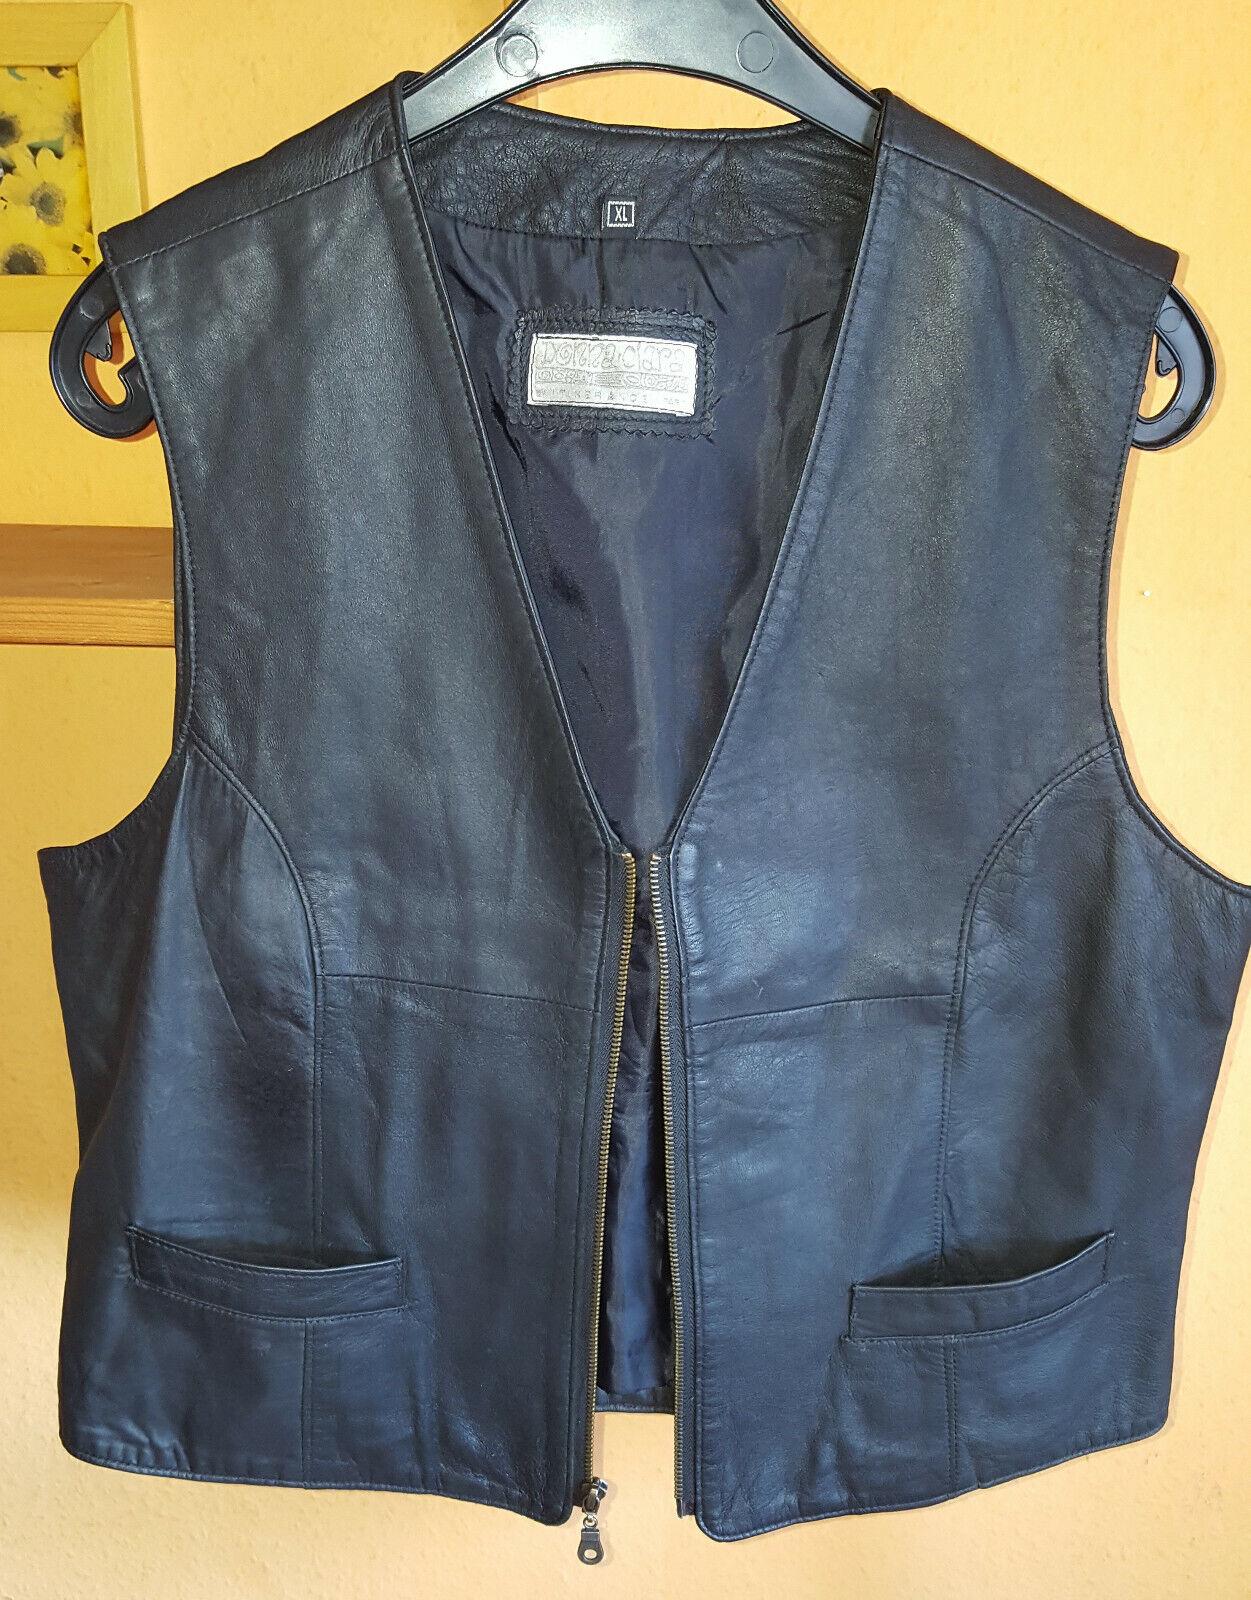 Damen-Lederweste,echtes Lammleder,schwarz,Größe XL